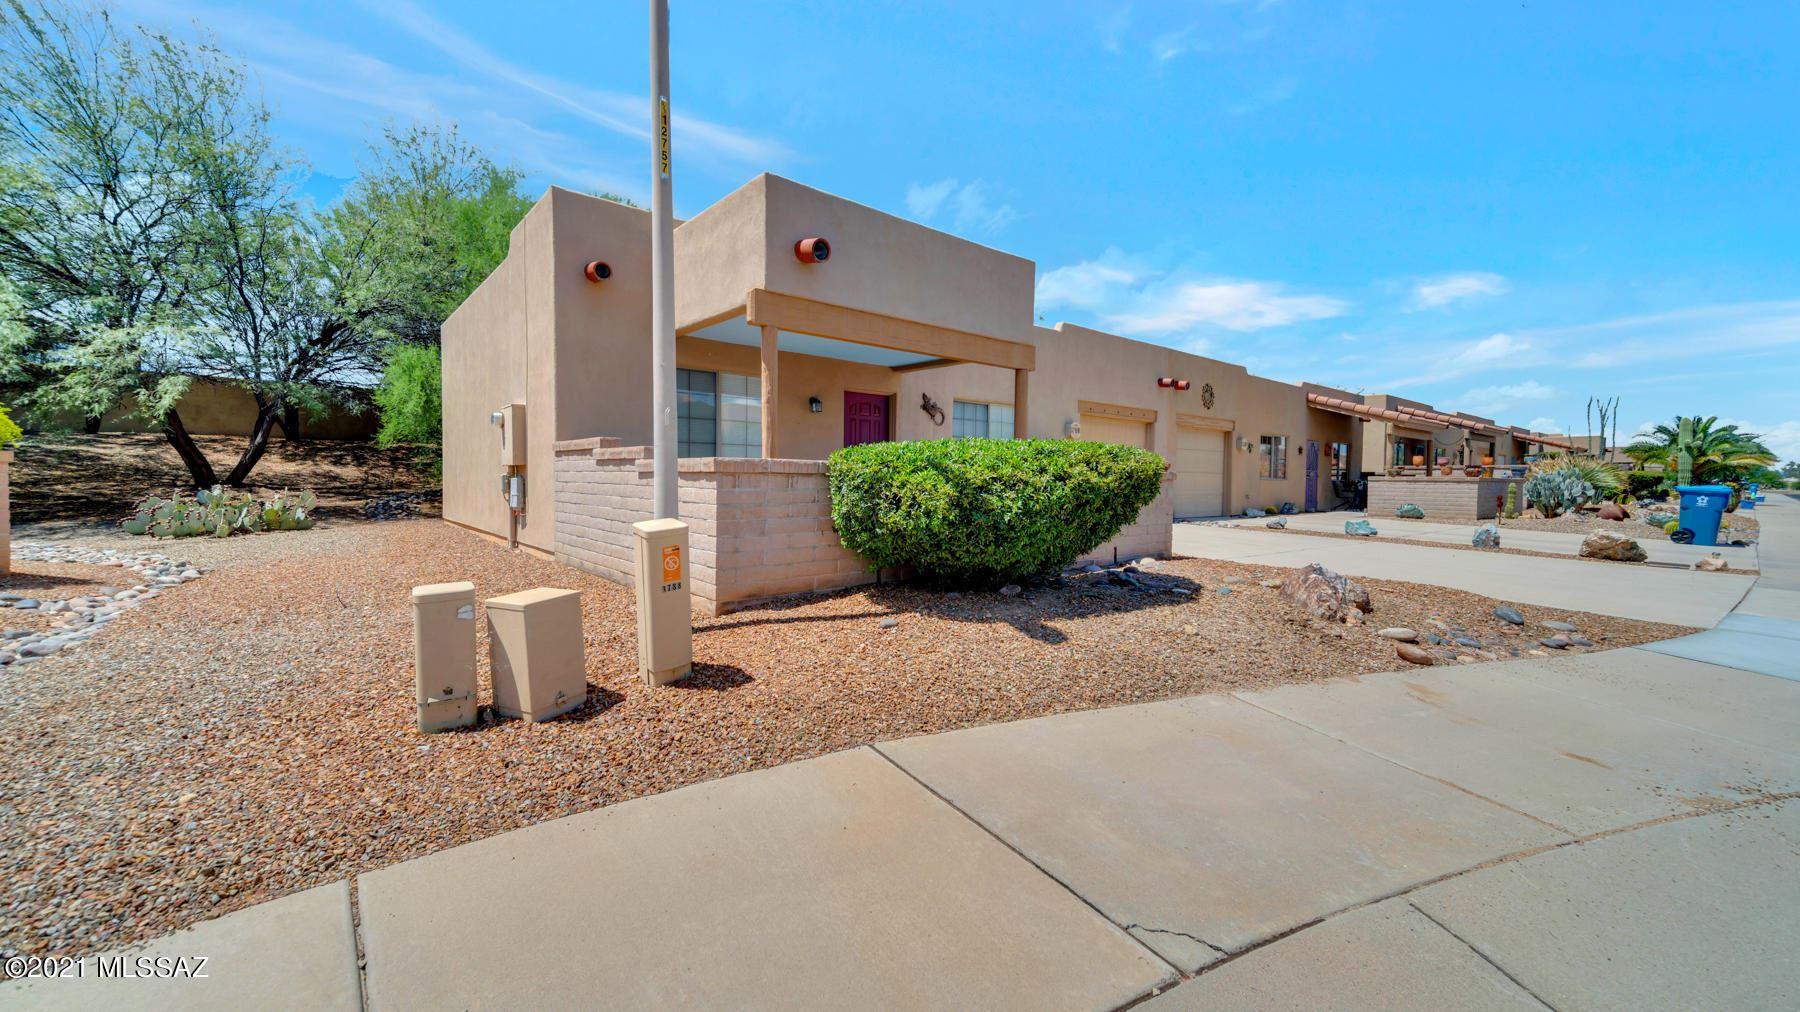 3788 S Paseo De Los Nardos, Green Valley, AZ 85614 - MLS#: 22121245